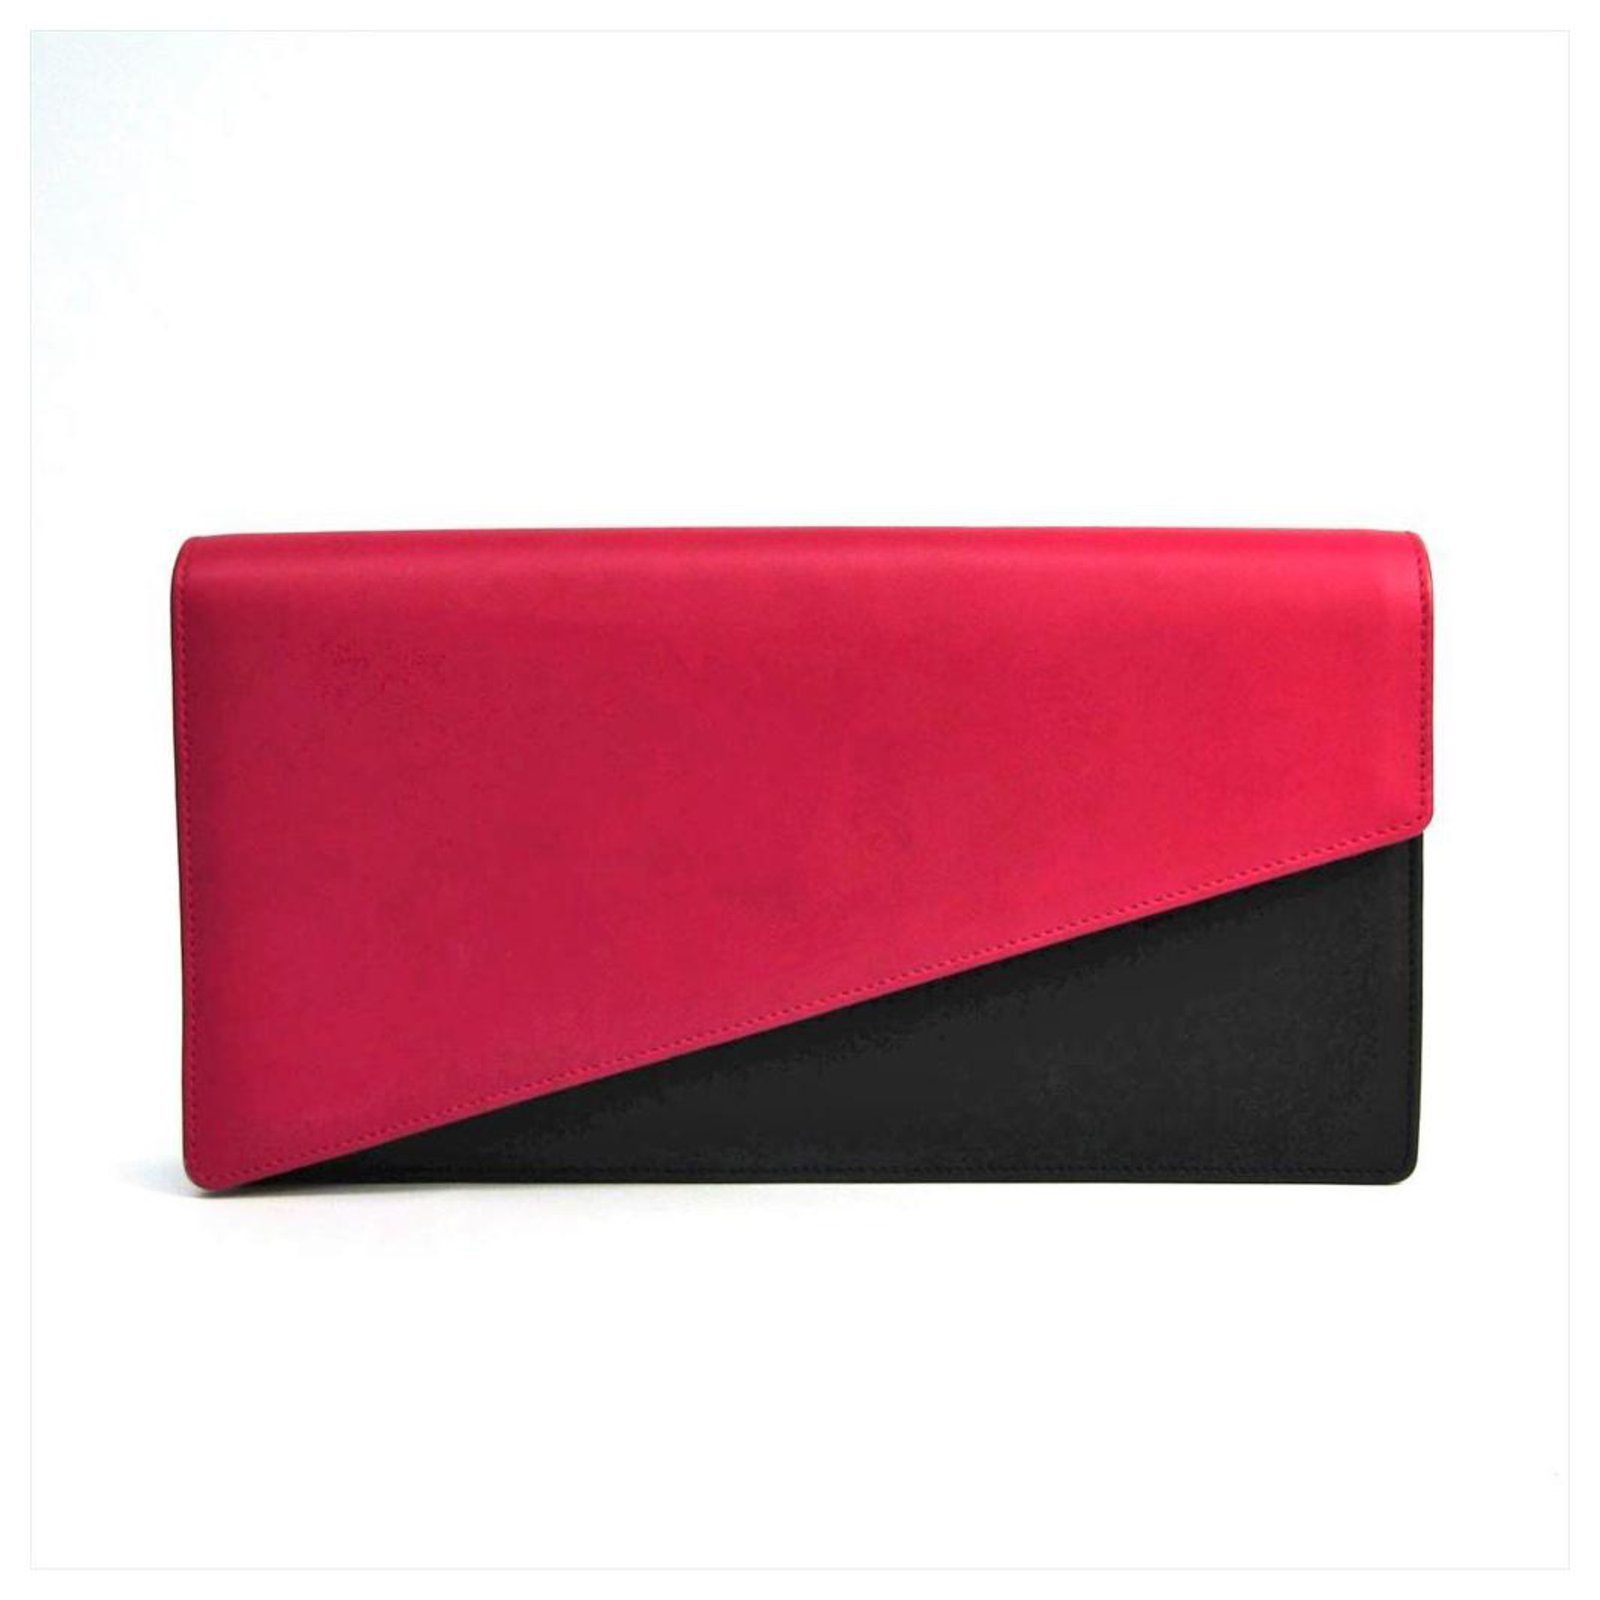 69fbf45e933 Yves Saint Laurent YSL Black Bi-color Leather Clutch Clutch bags  Leather,Pony-